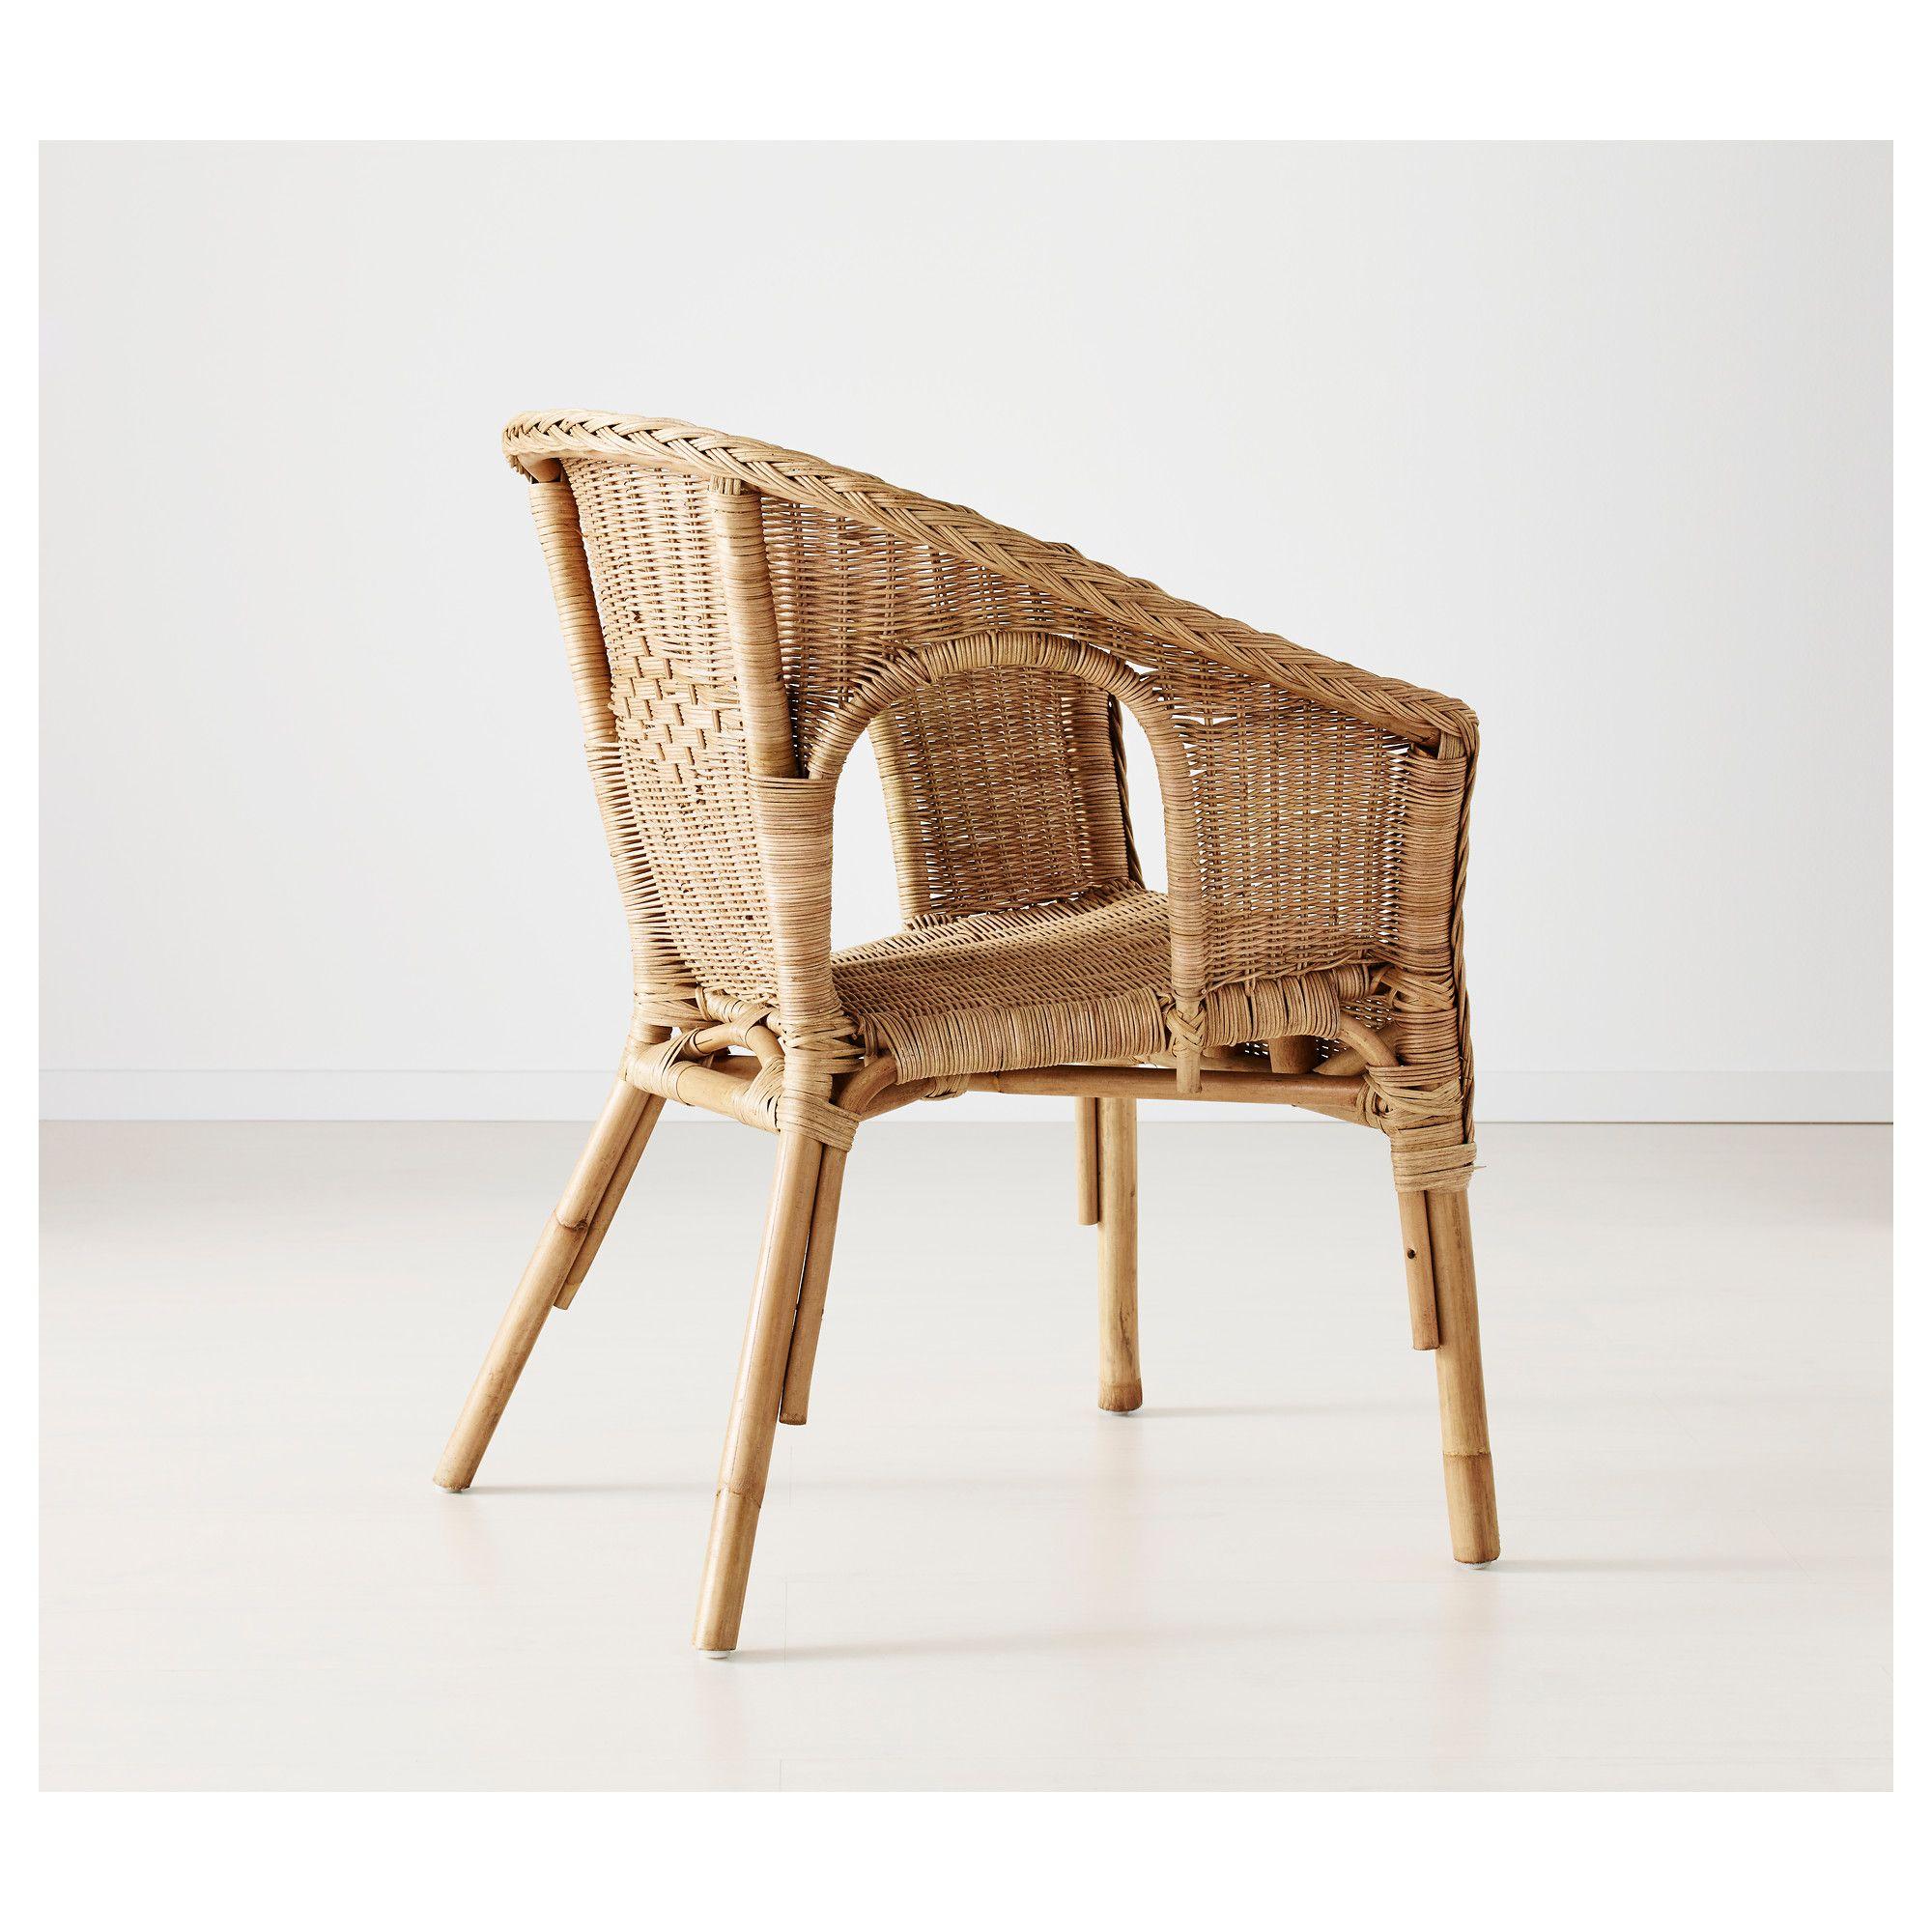 Poltrone In Rattan Ikea.Ikea Agen Rattan Bamboo Armchair Home Decor In 2019